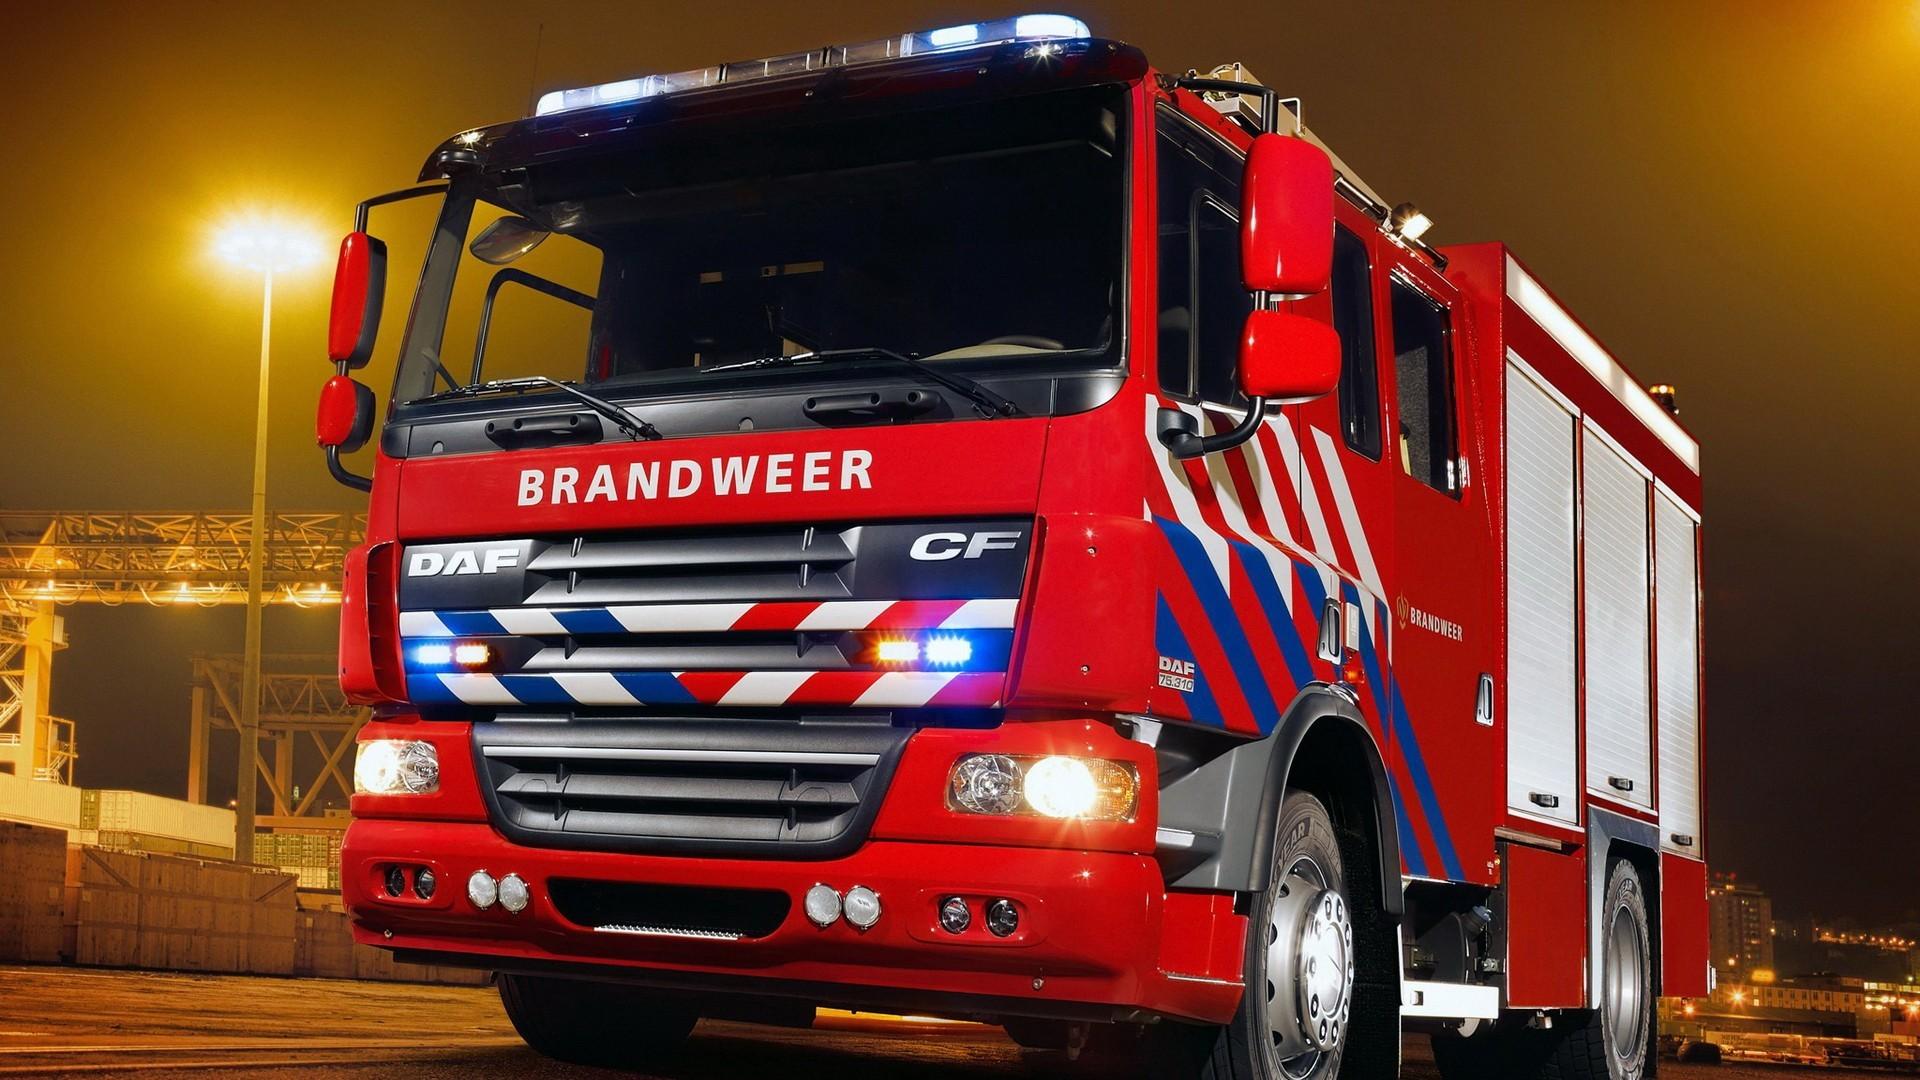 Firefighter Wallpaper Backgrounds Hero Pro Hd